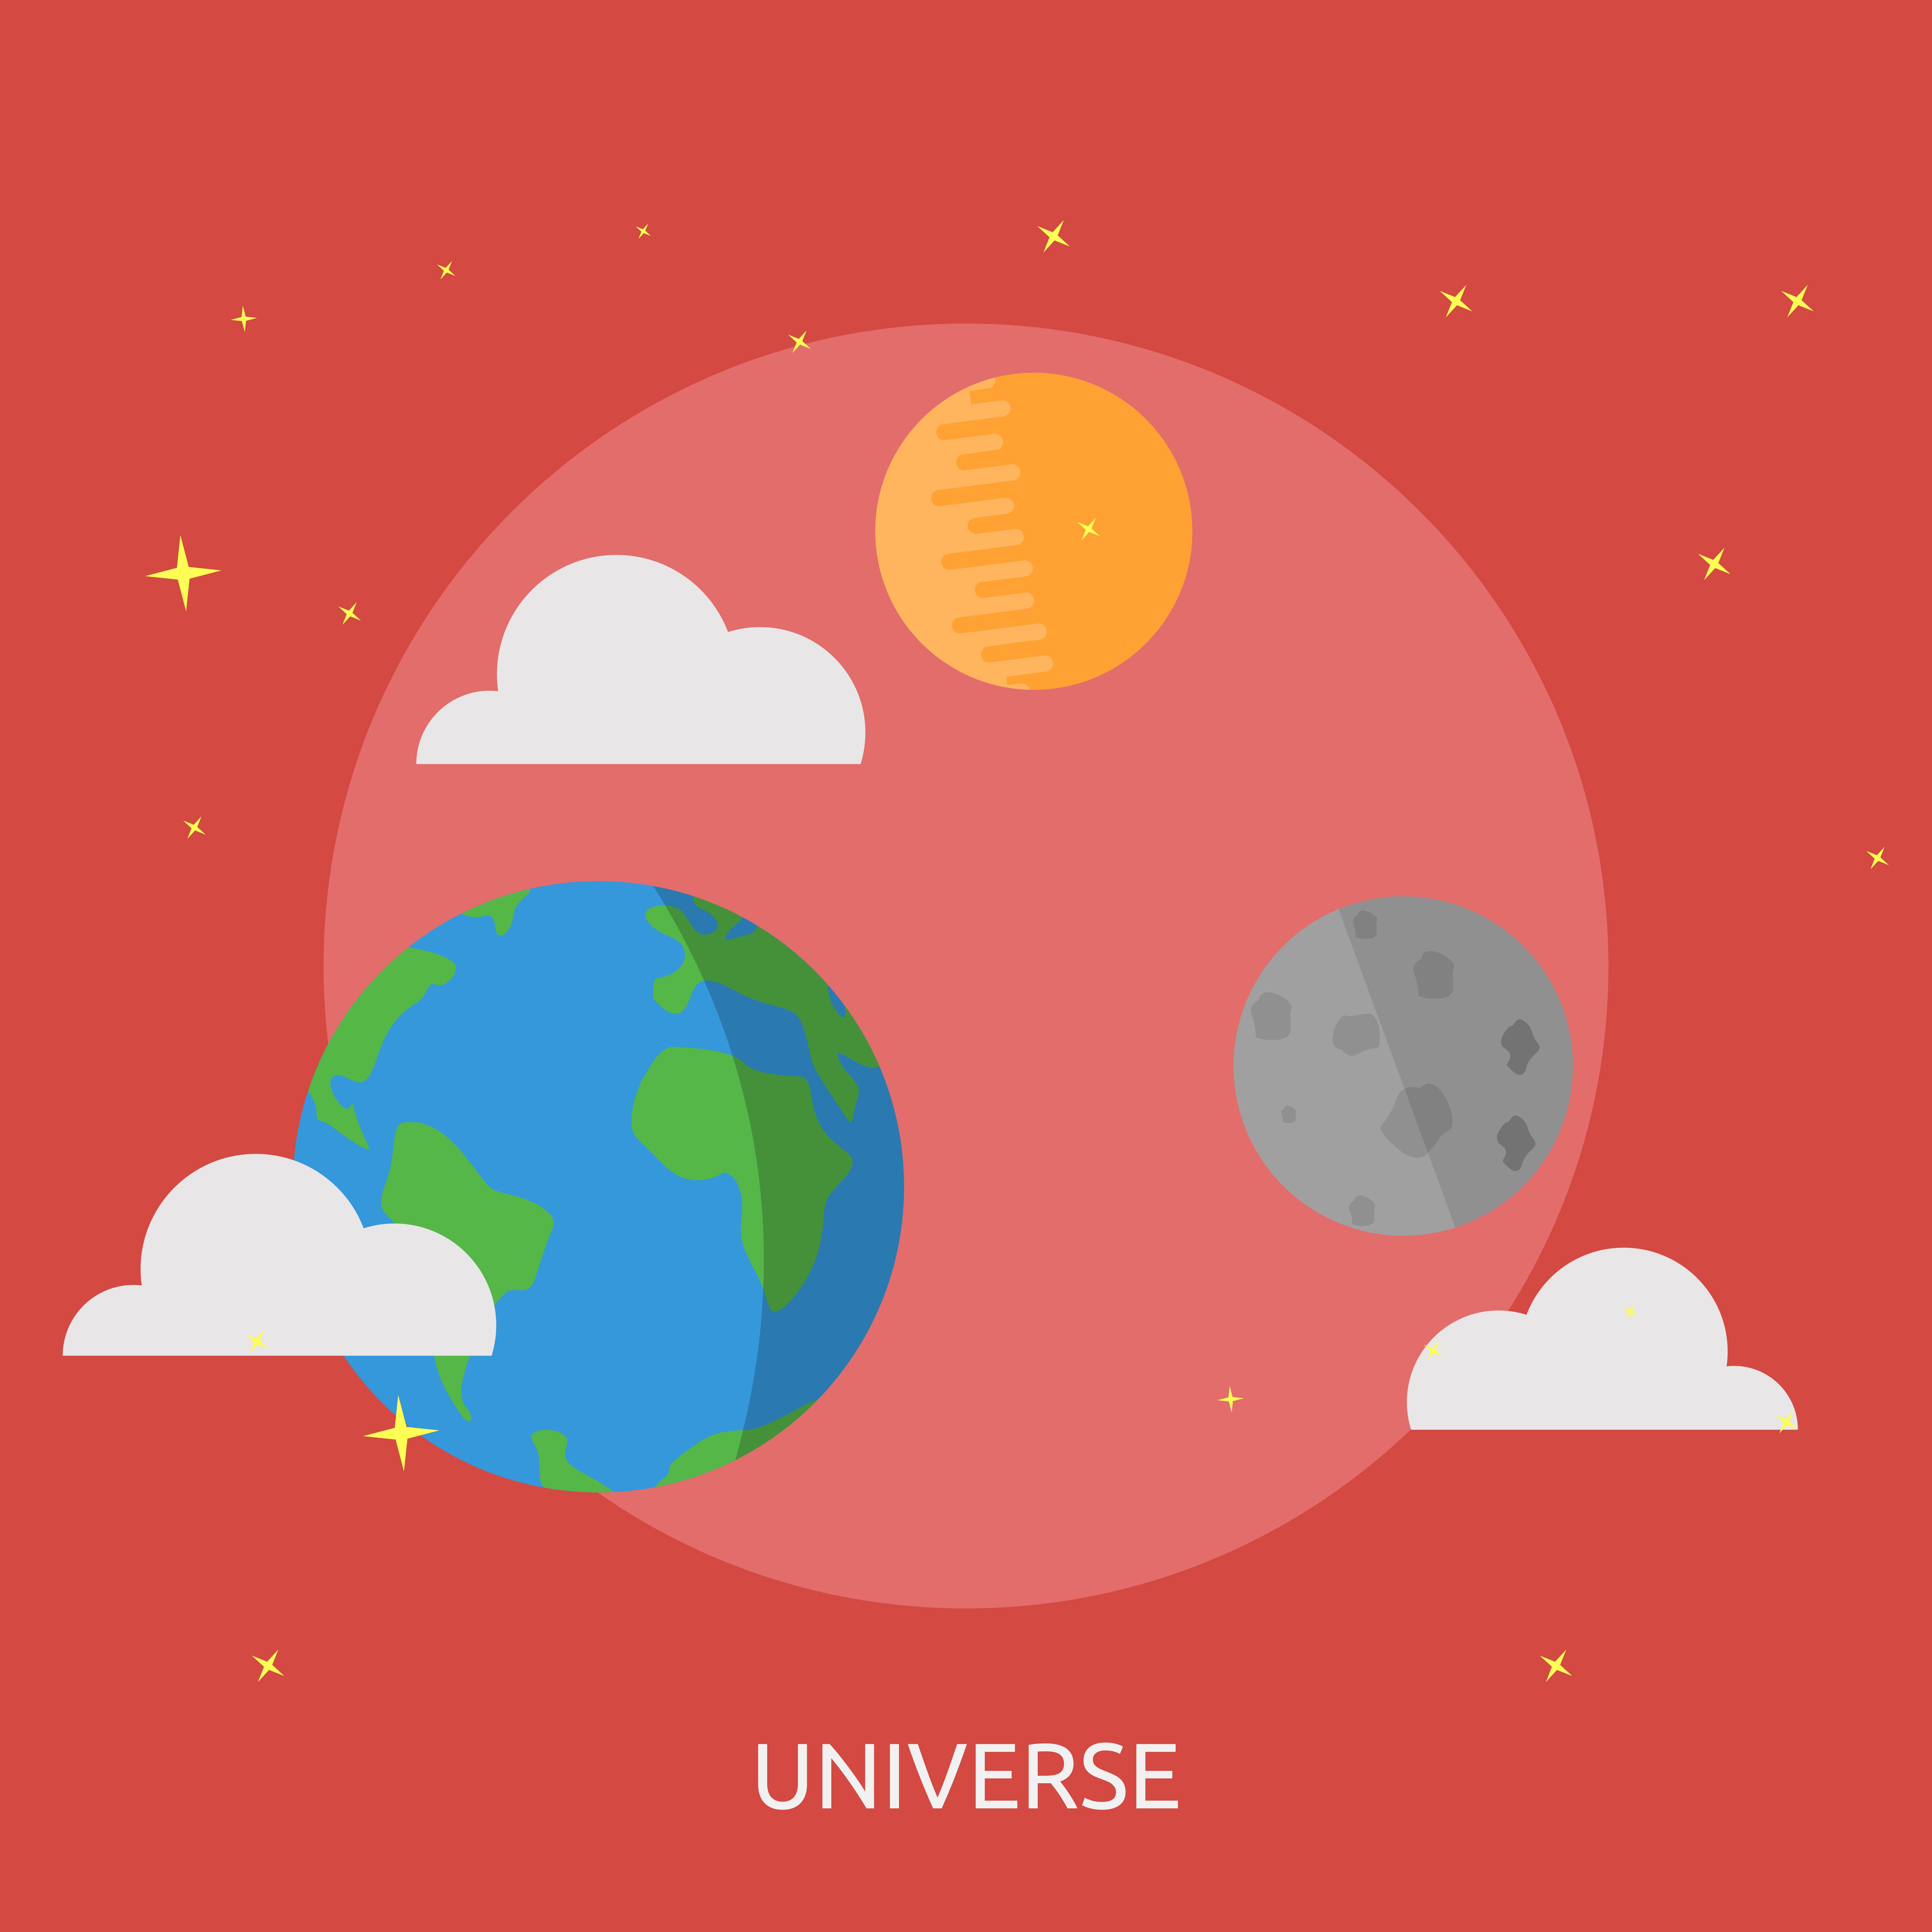 Universe Conceptual Illustration Design